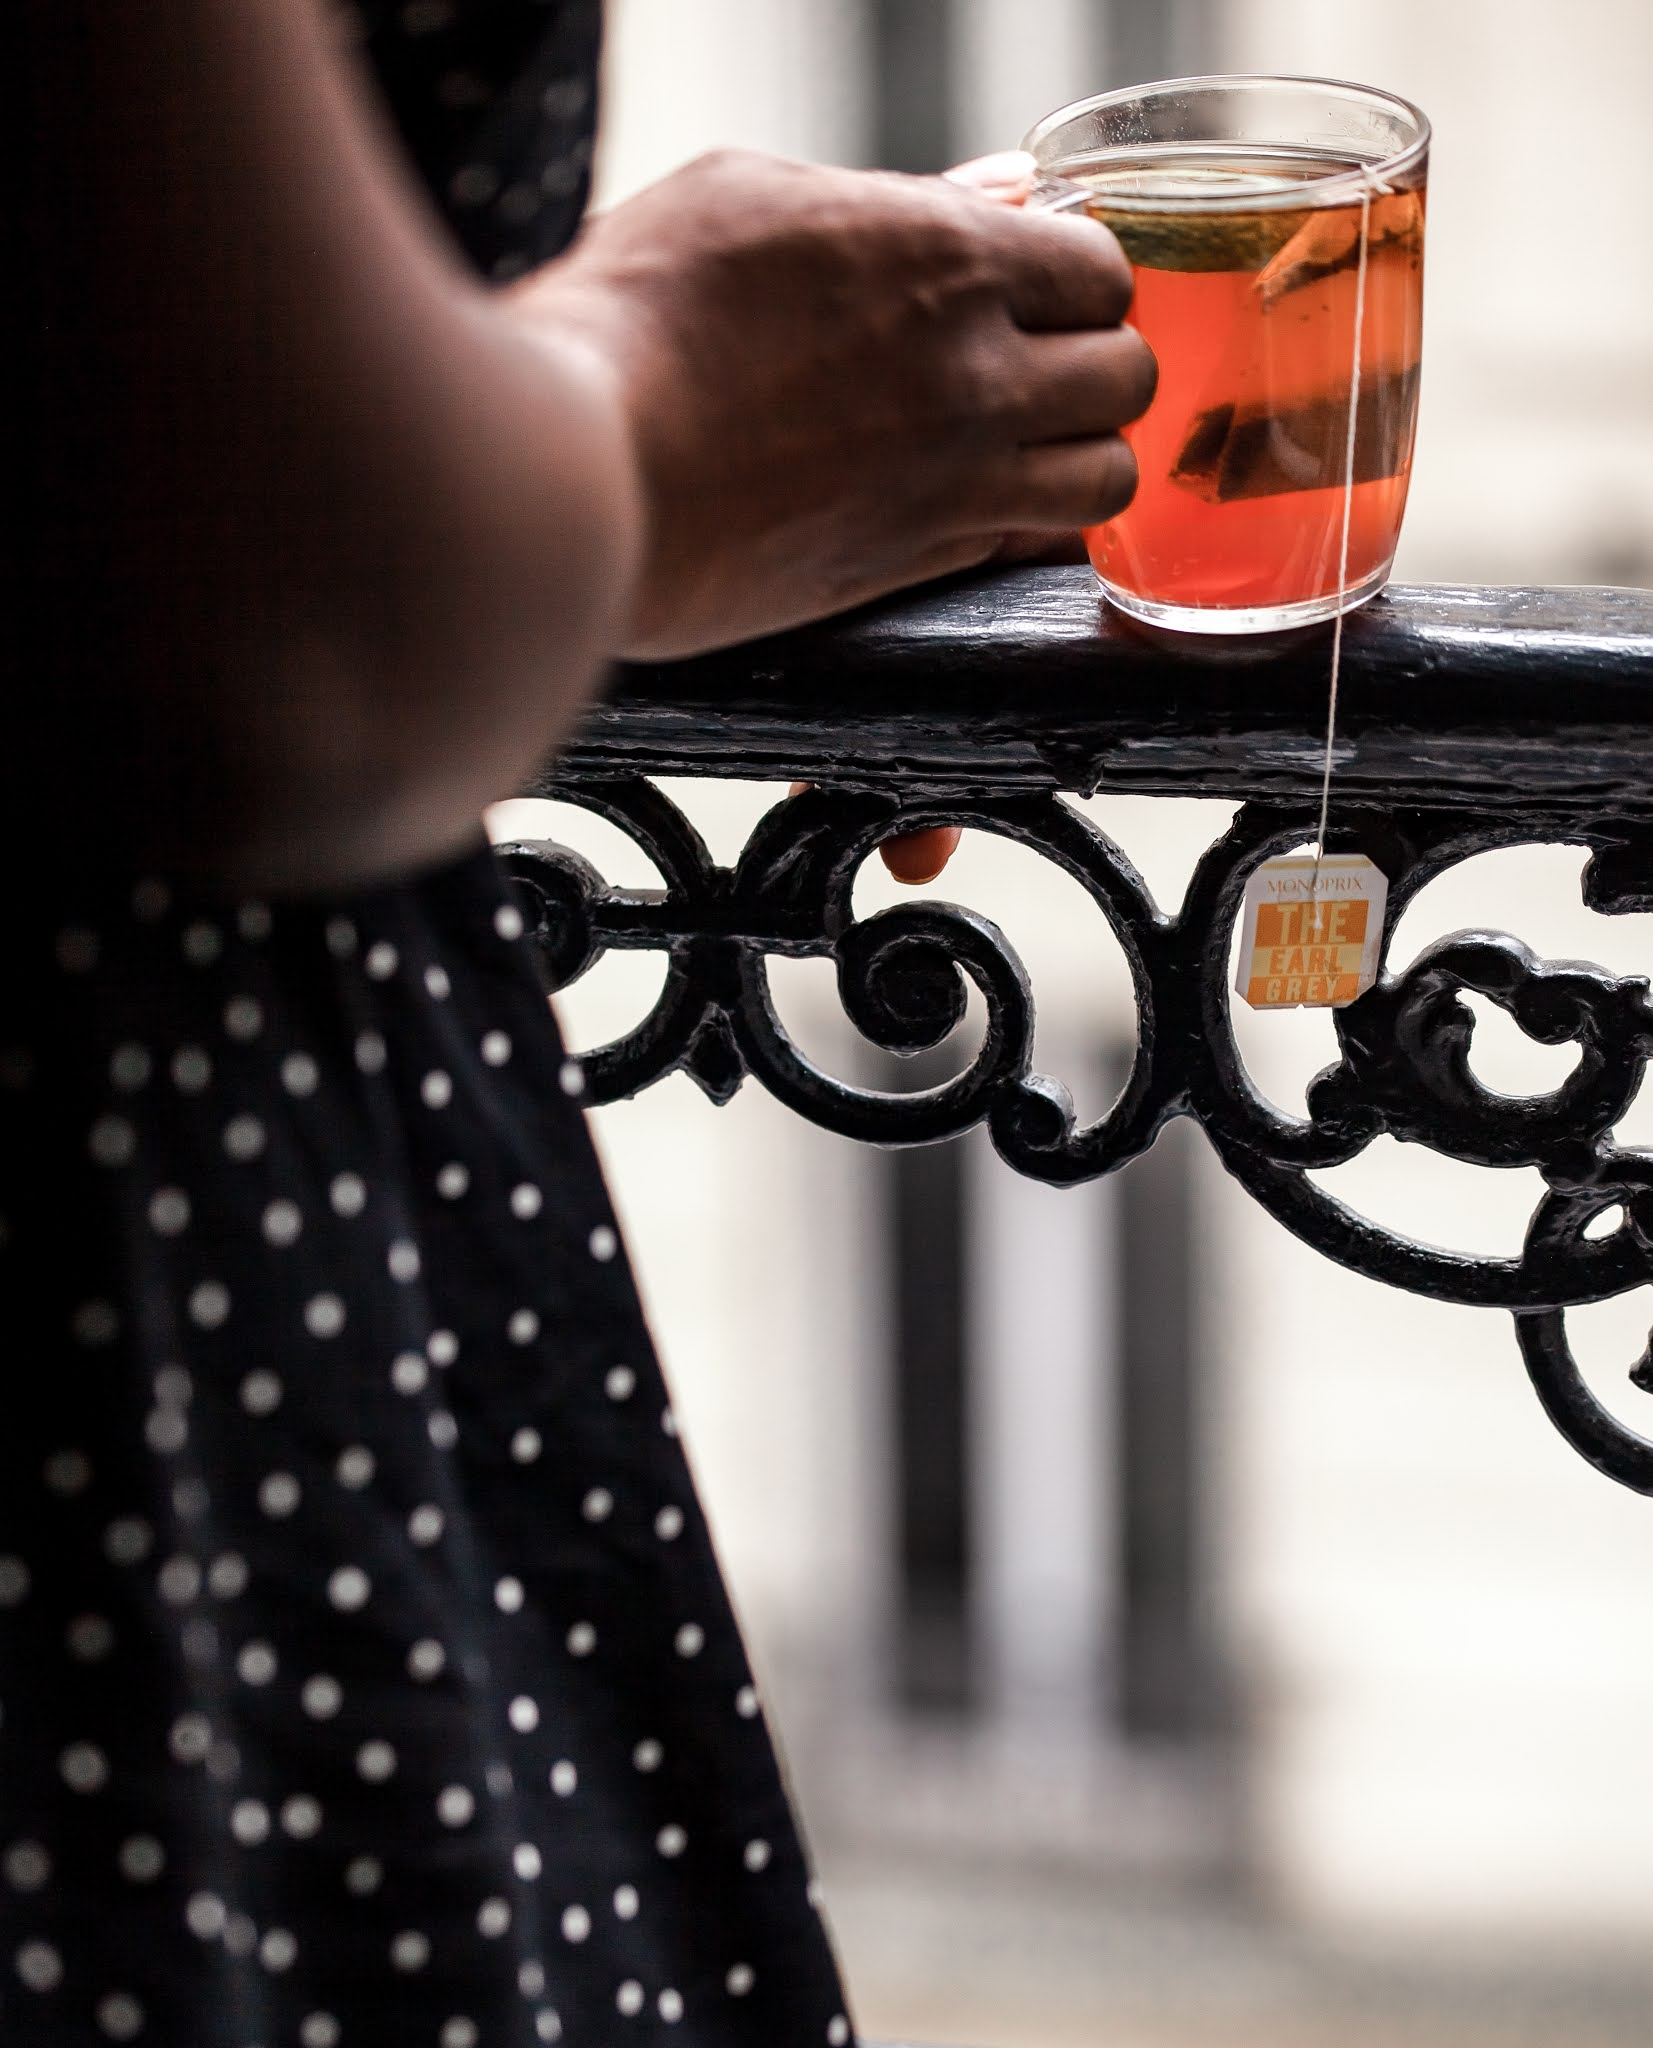 Starting a freelance creative photograpy career by Sugar Hamock in Paris